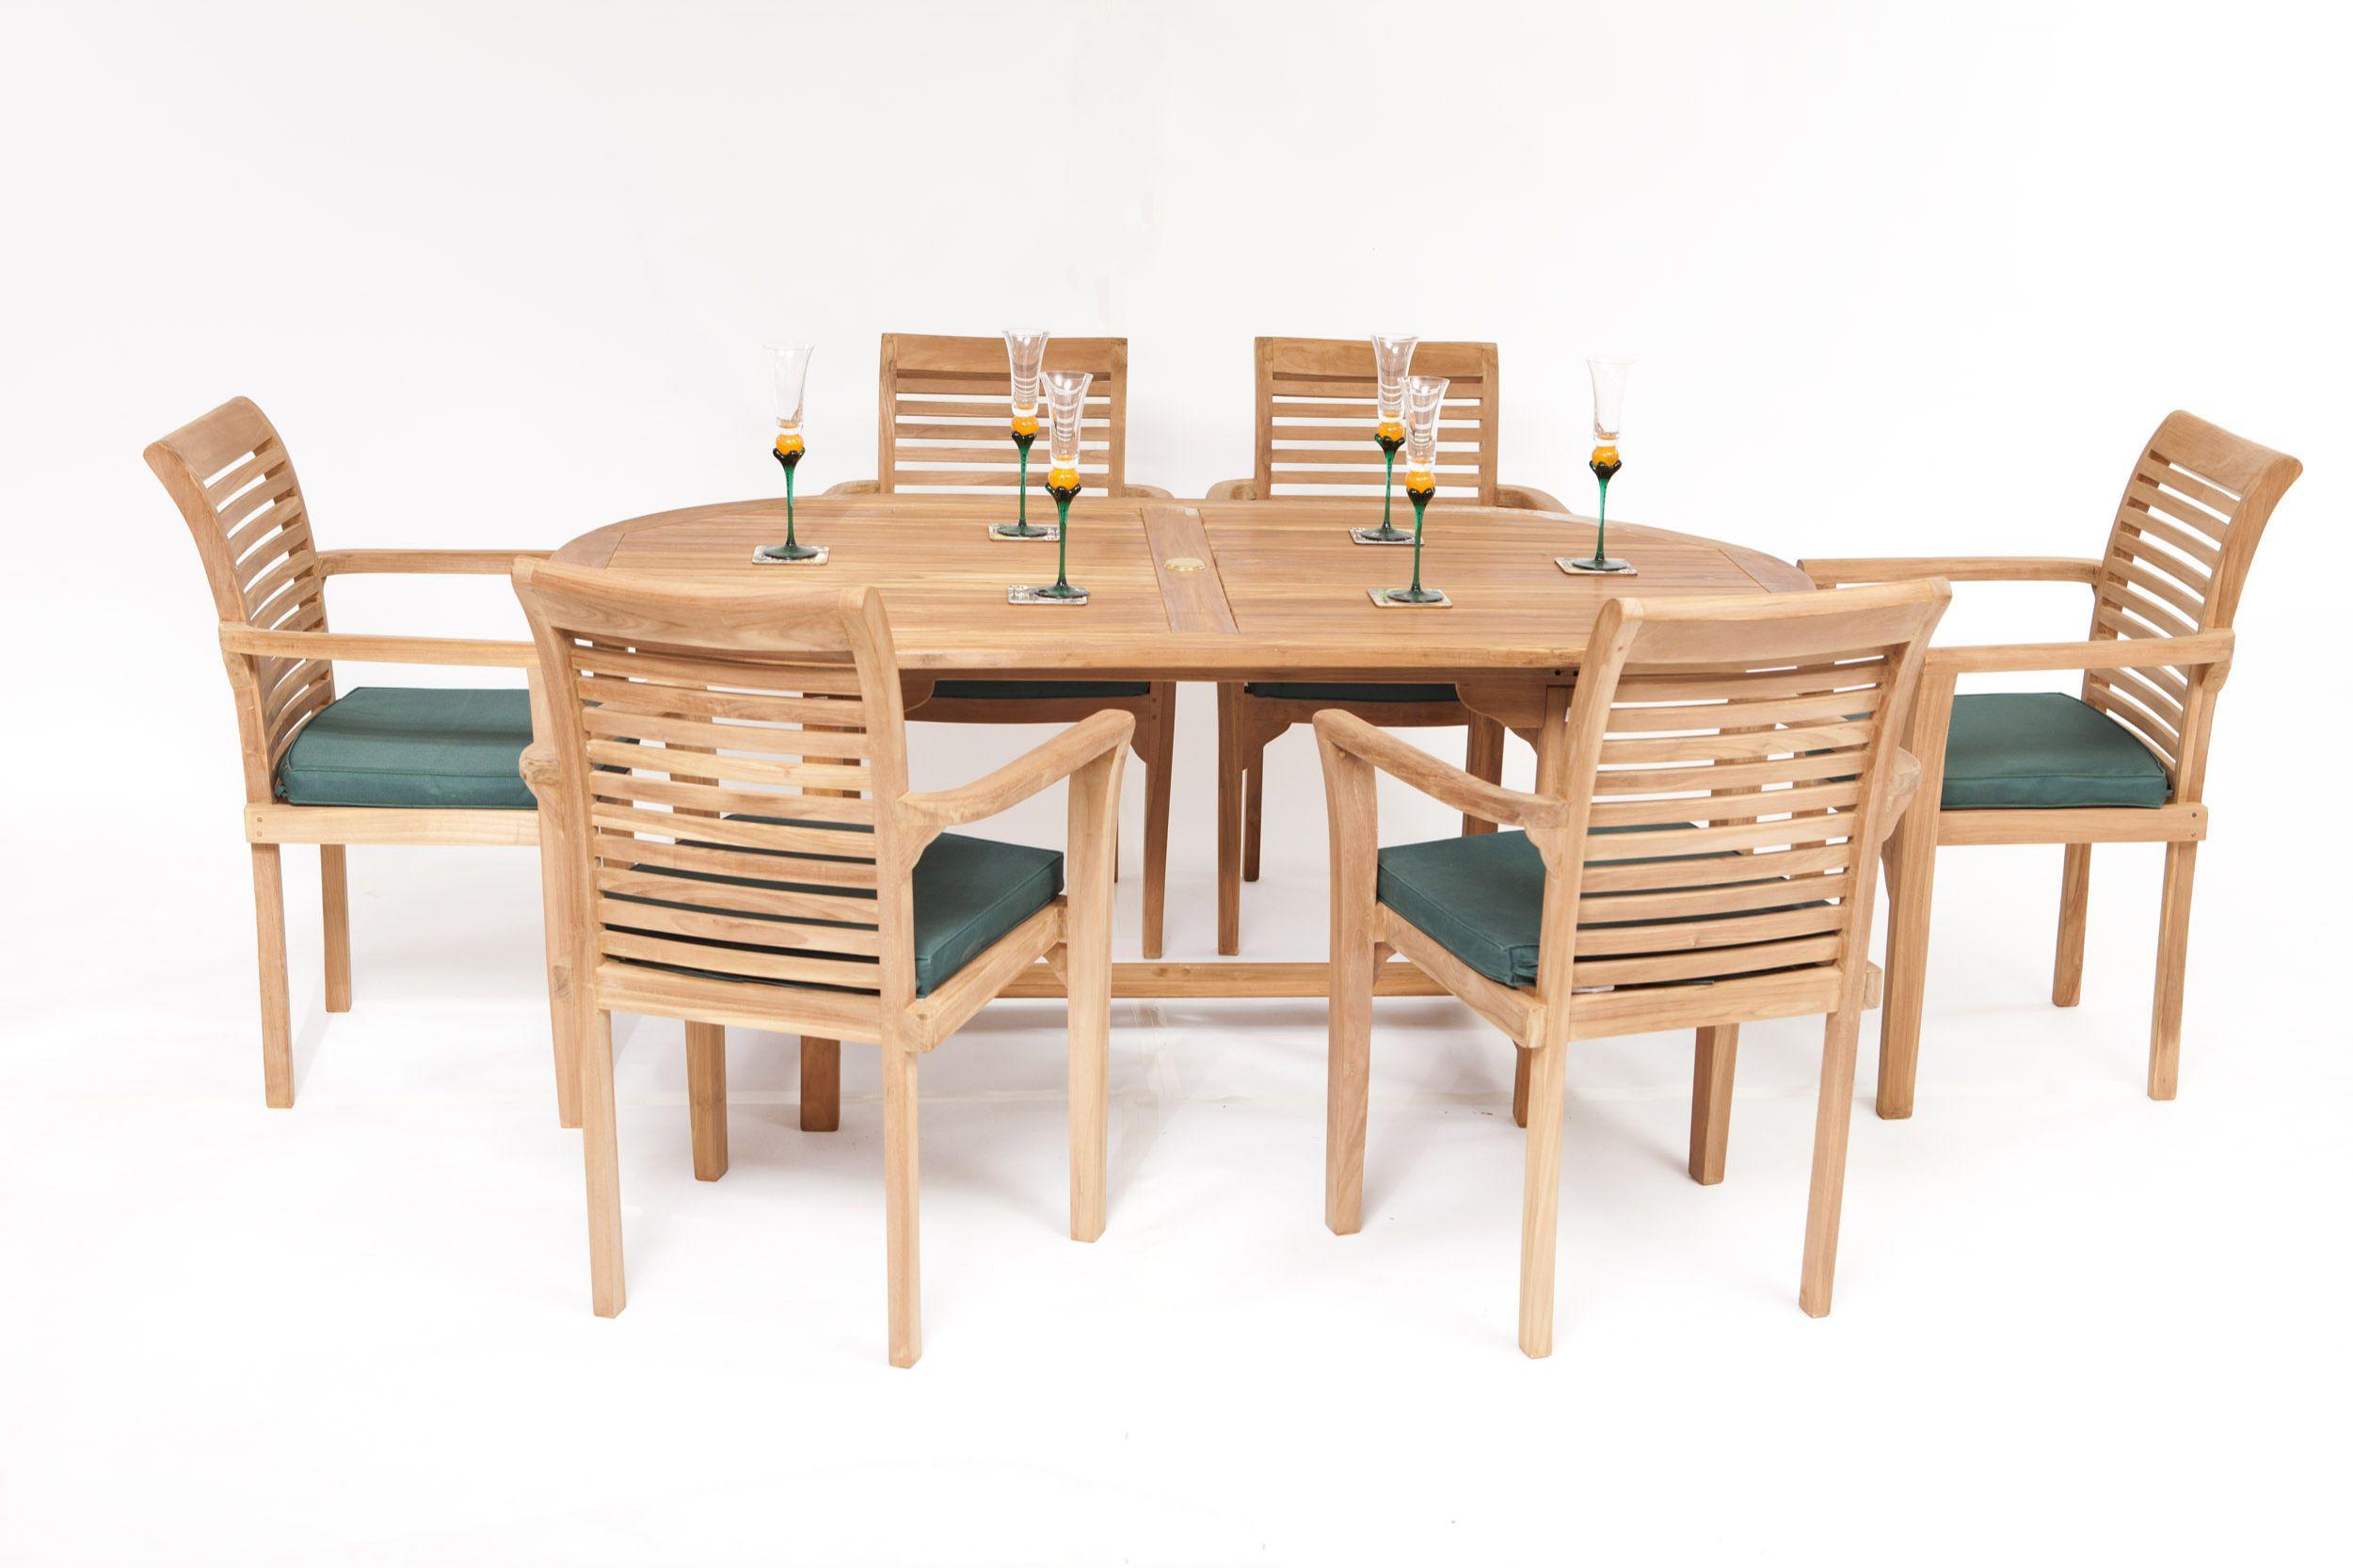 Syracruse Teak Dining And Garden Set